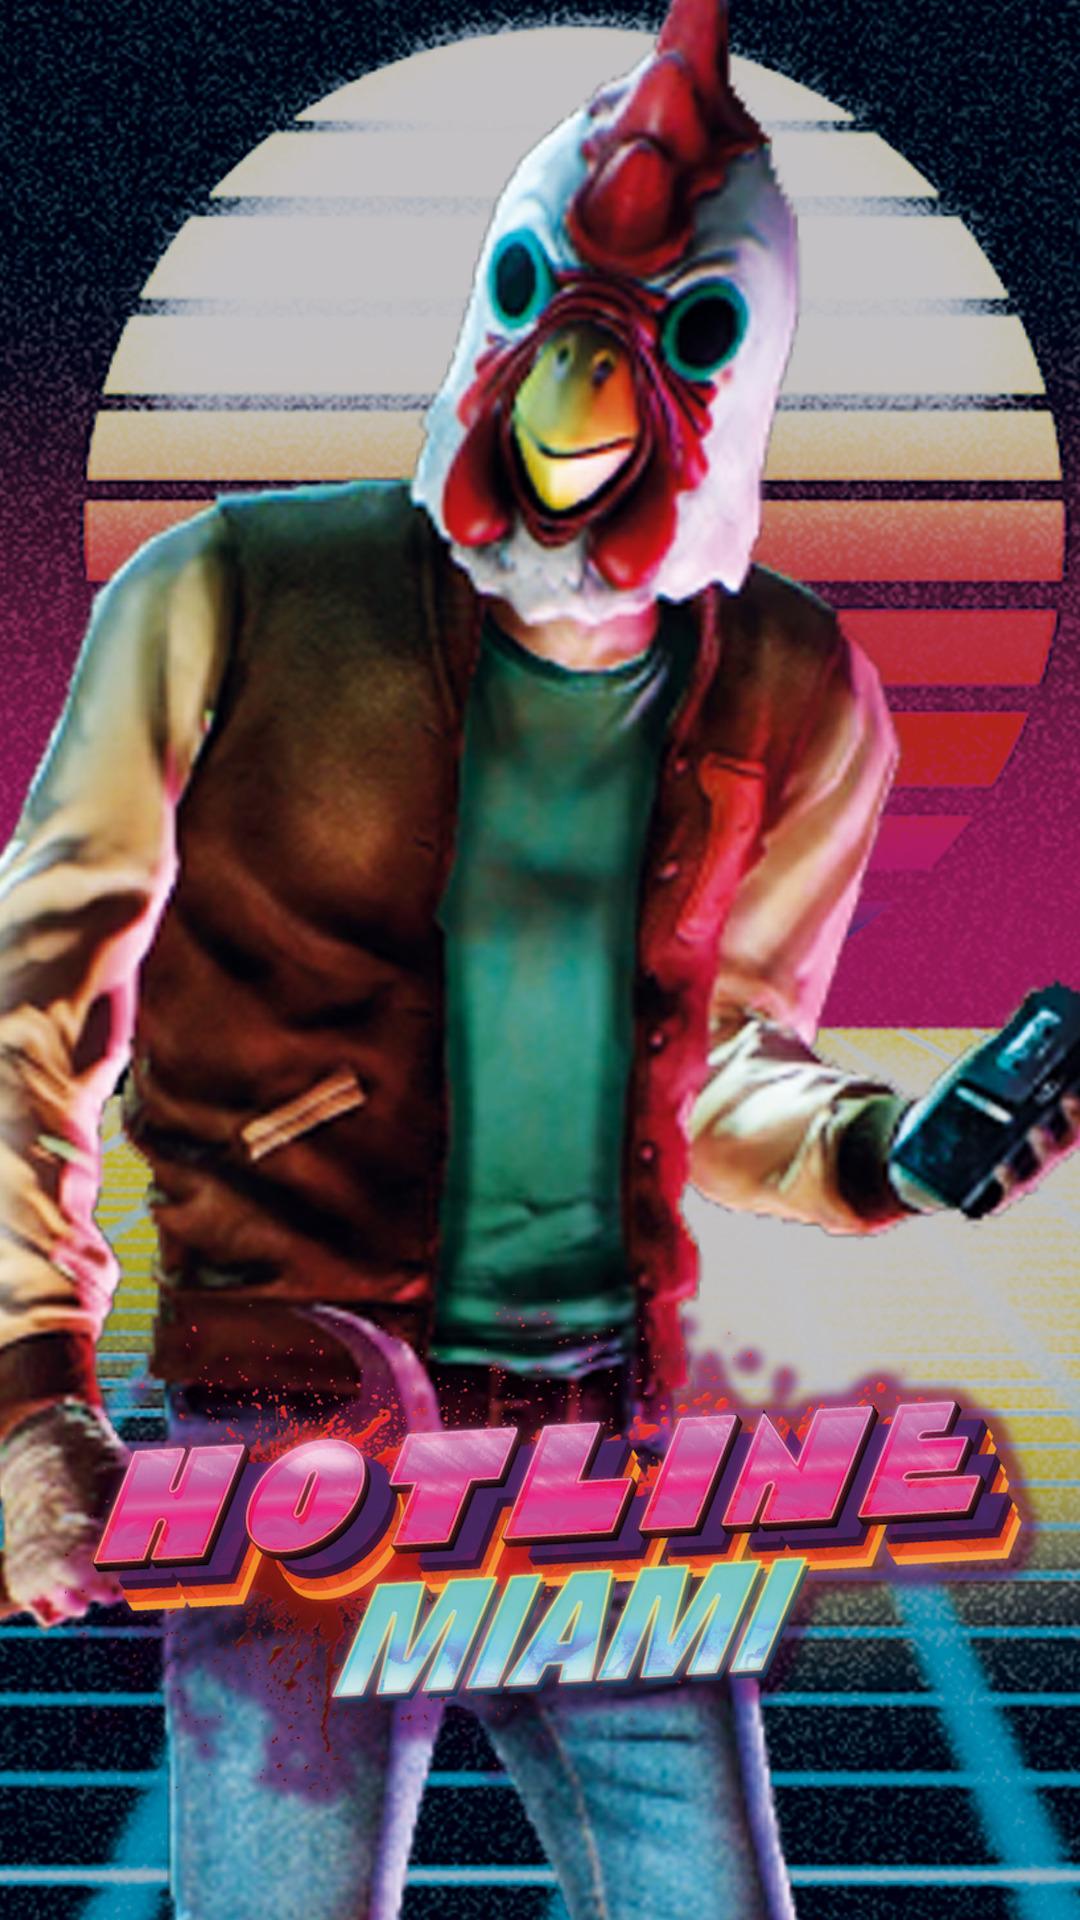 Jacket Wallpaper - Jacket Payday 2 Art , HD Wallpaper & Backgrounds